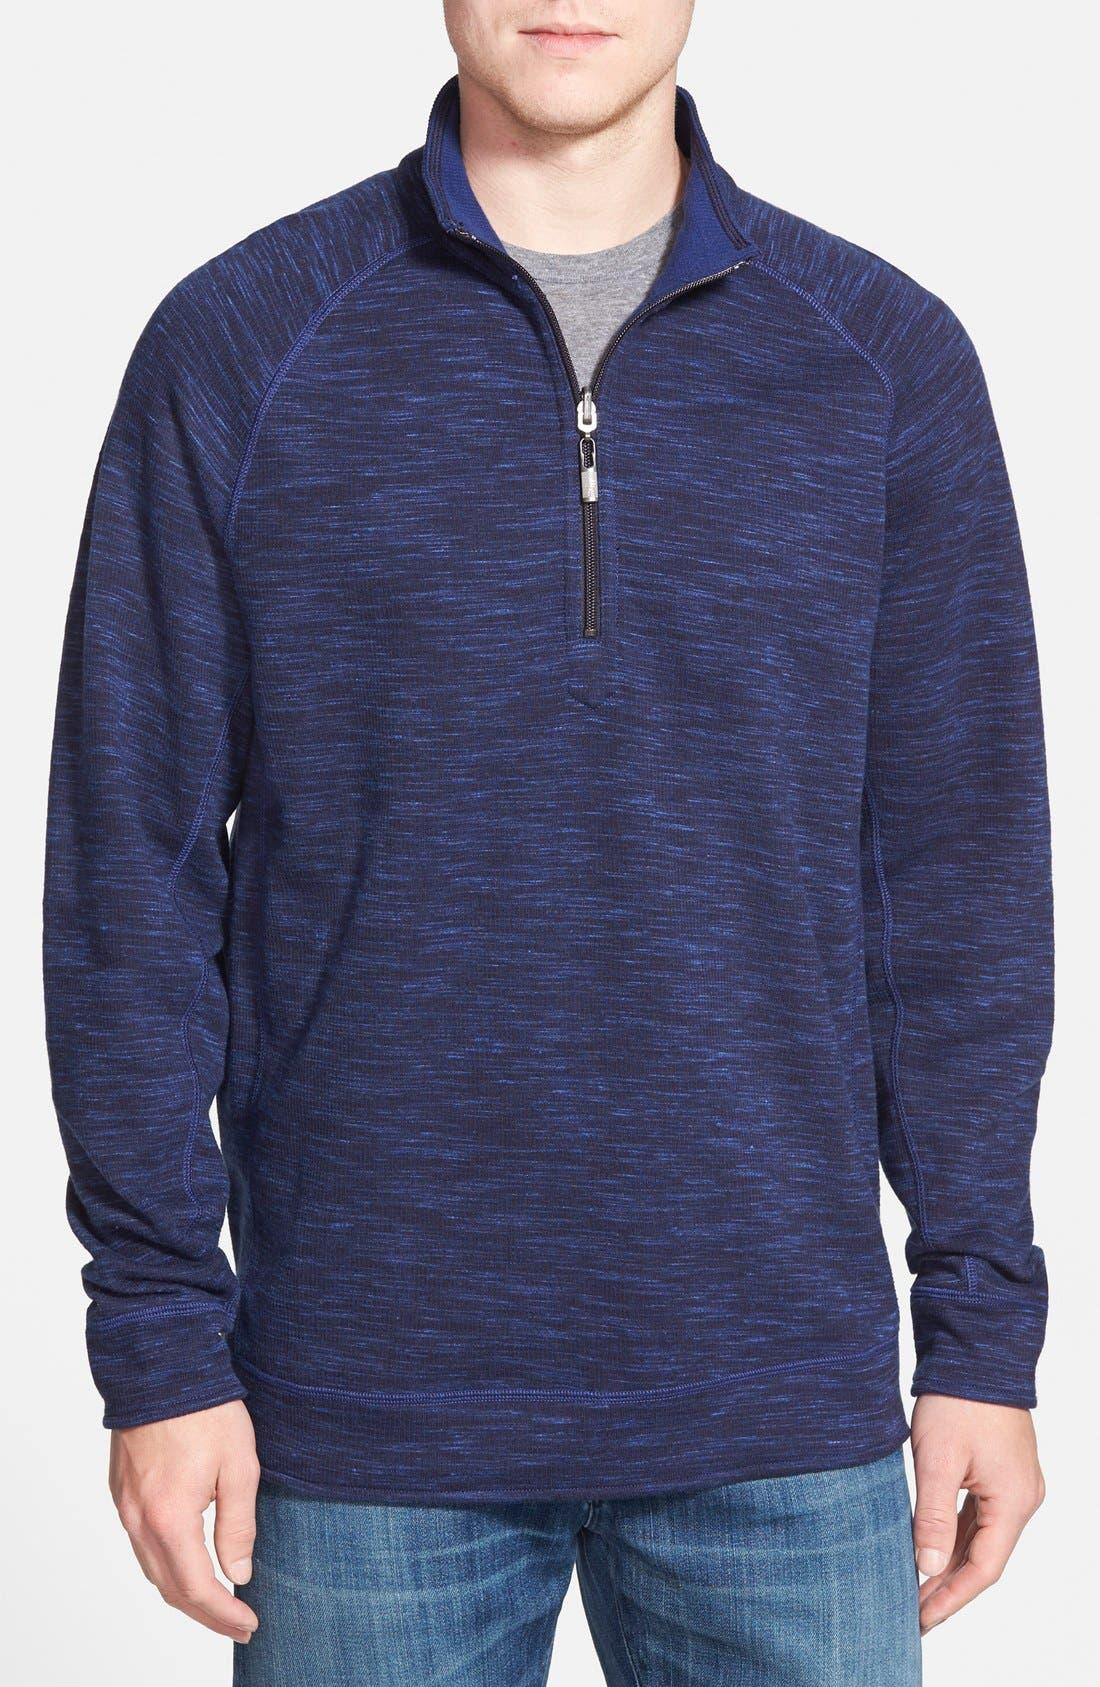 Alternate Image 1 Selected - Tommy Bahama Slubtropics Reversible Half Zip Pullover